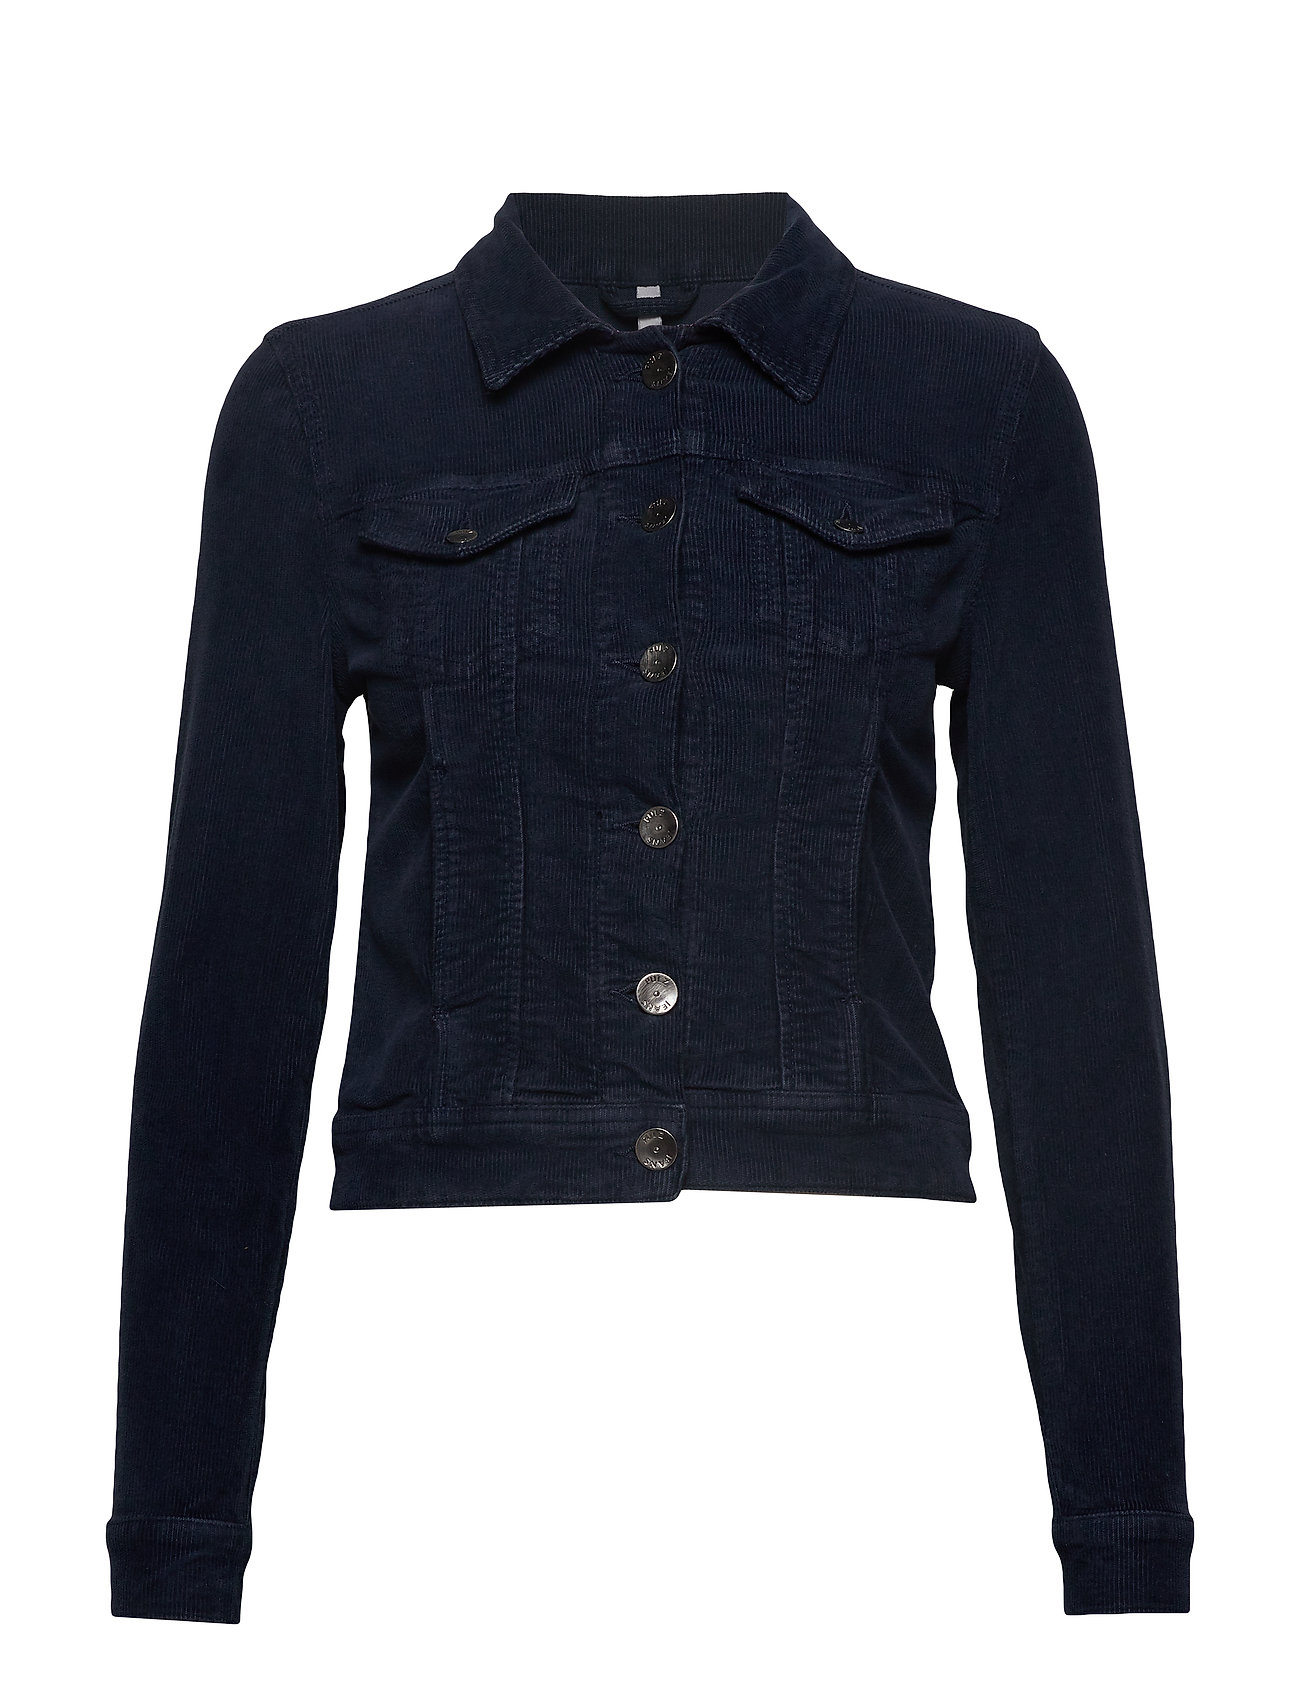 Pulz Jeans PZSIRA Jacket - BLUE MARINE